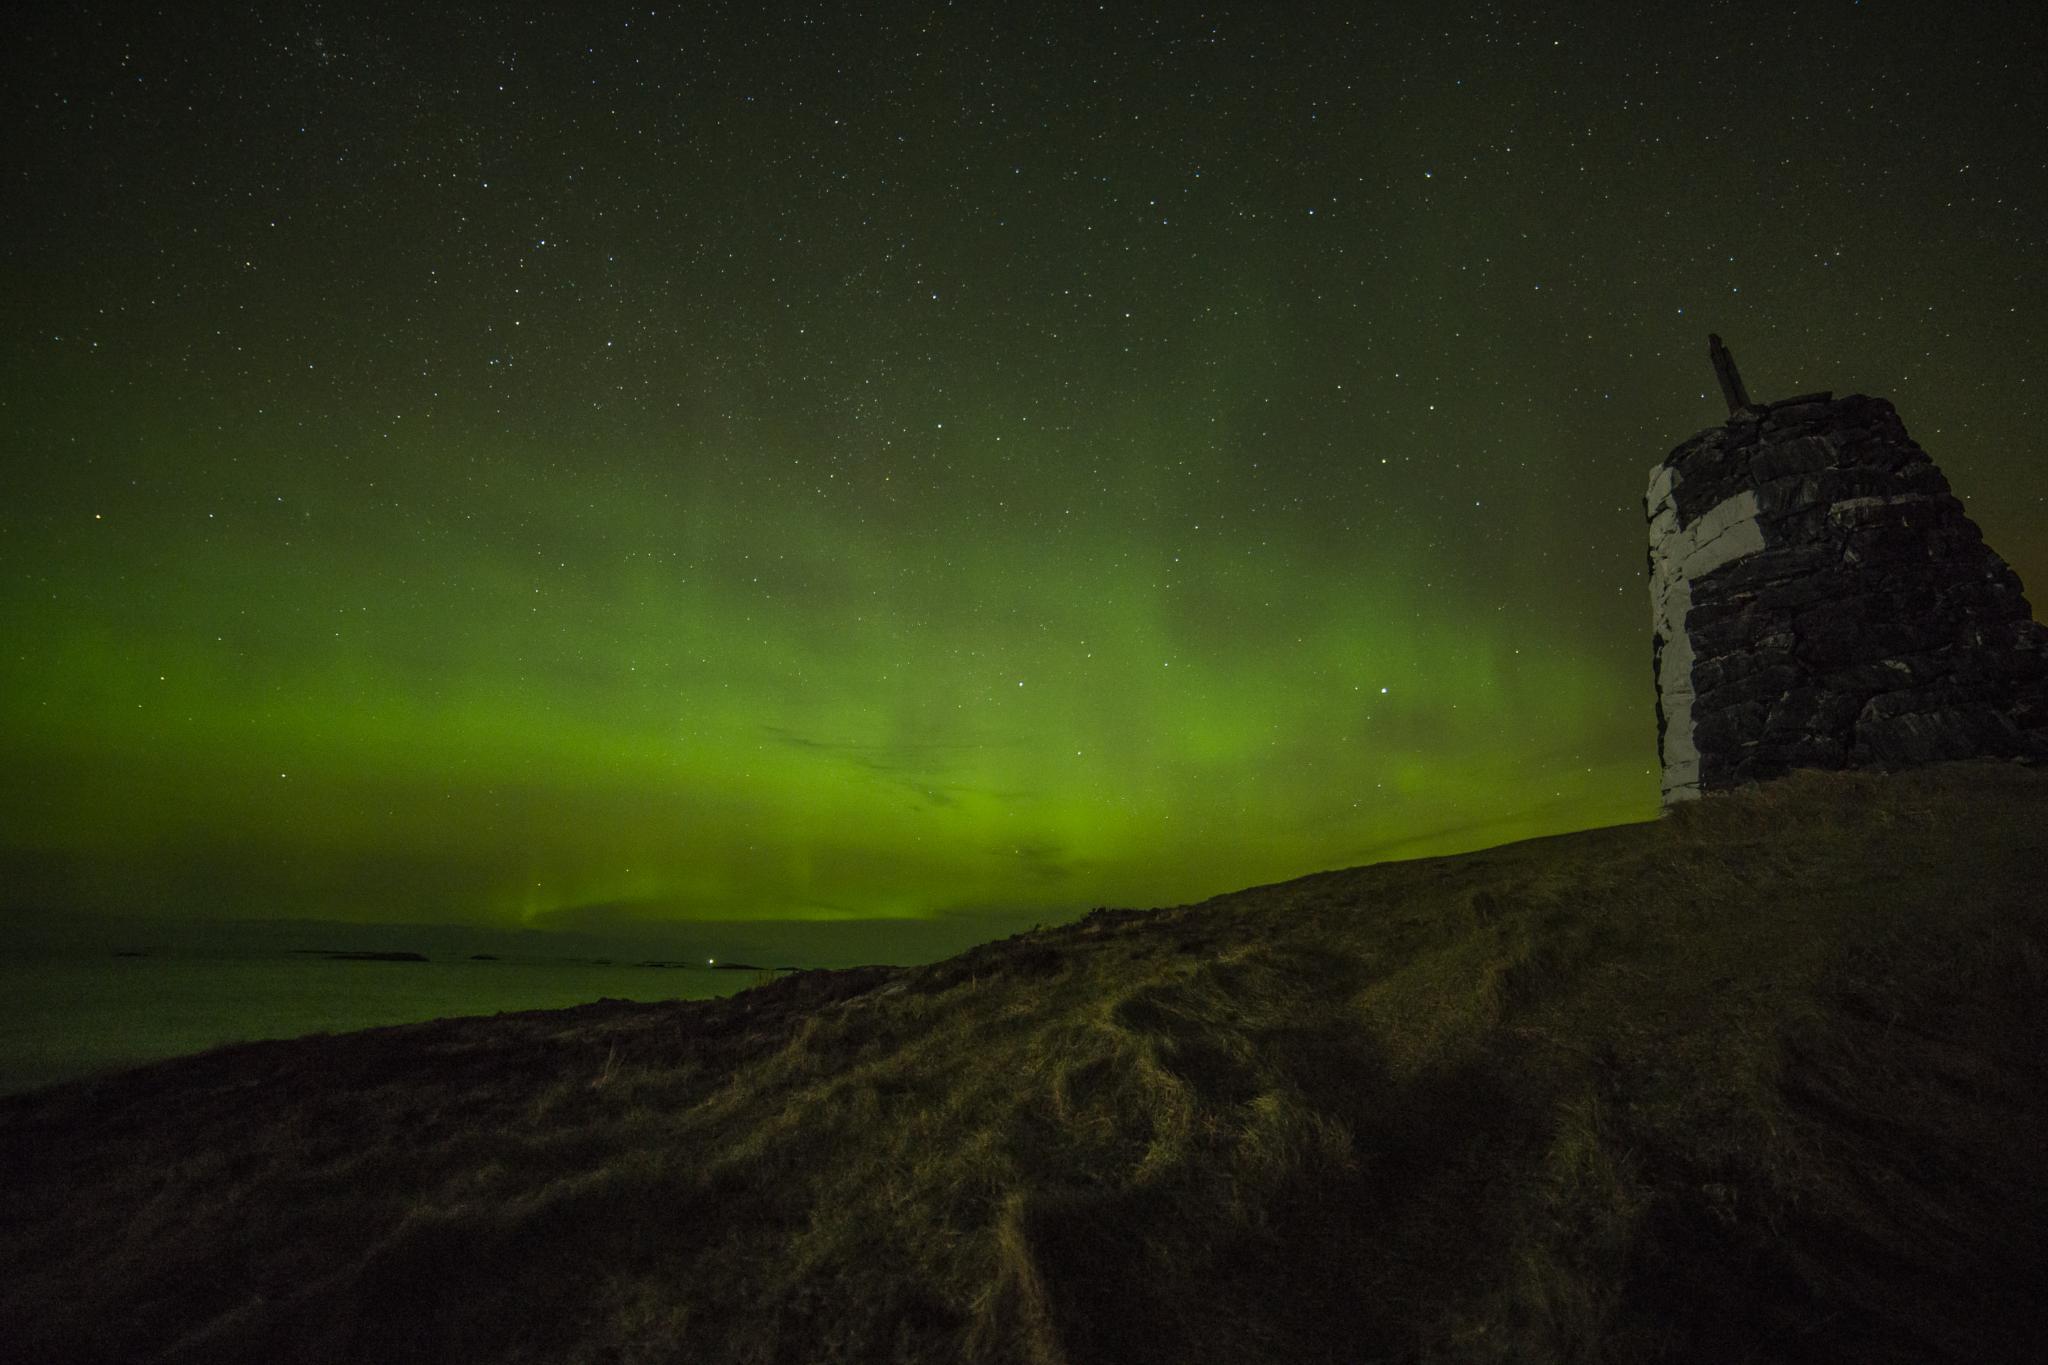 Magical aurora night by roger.kummervold